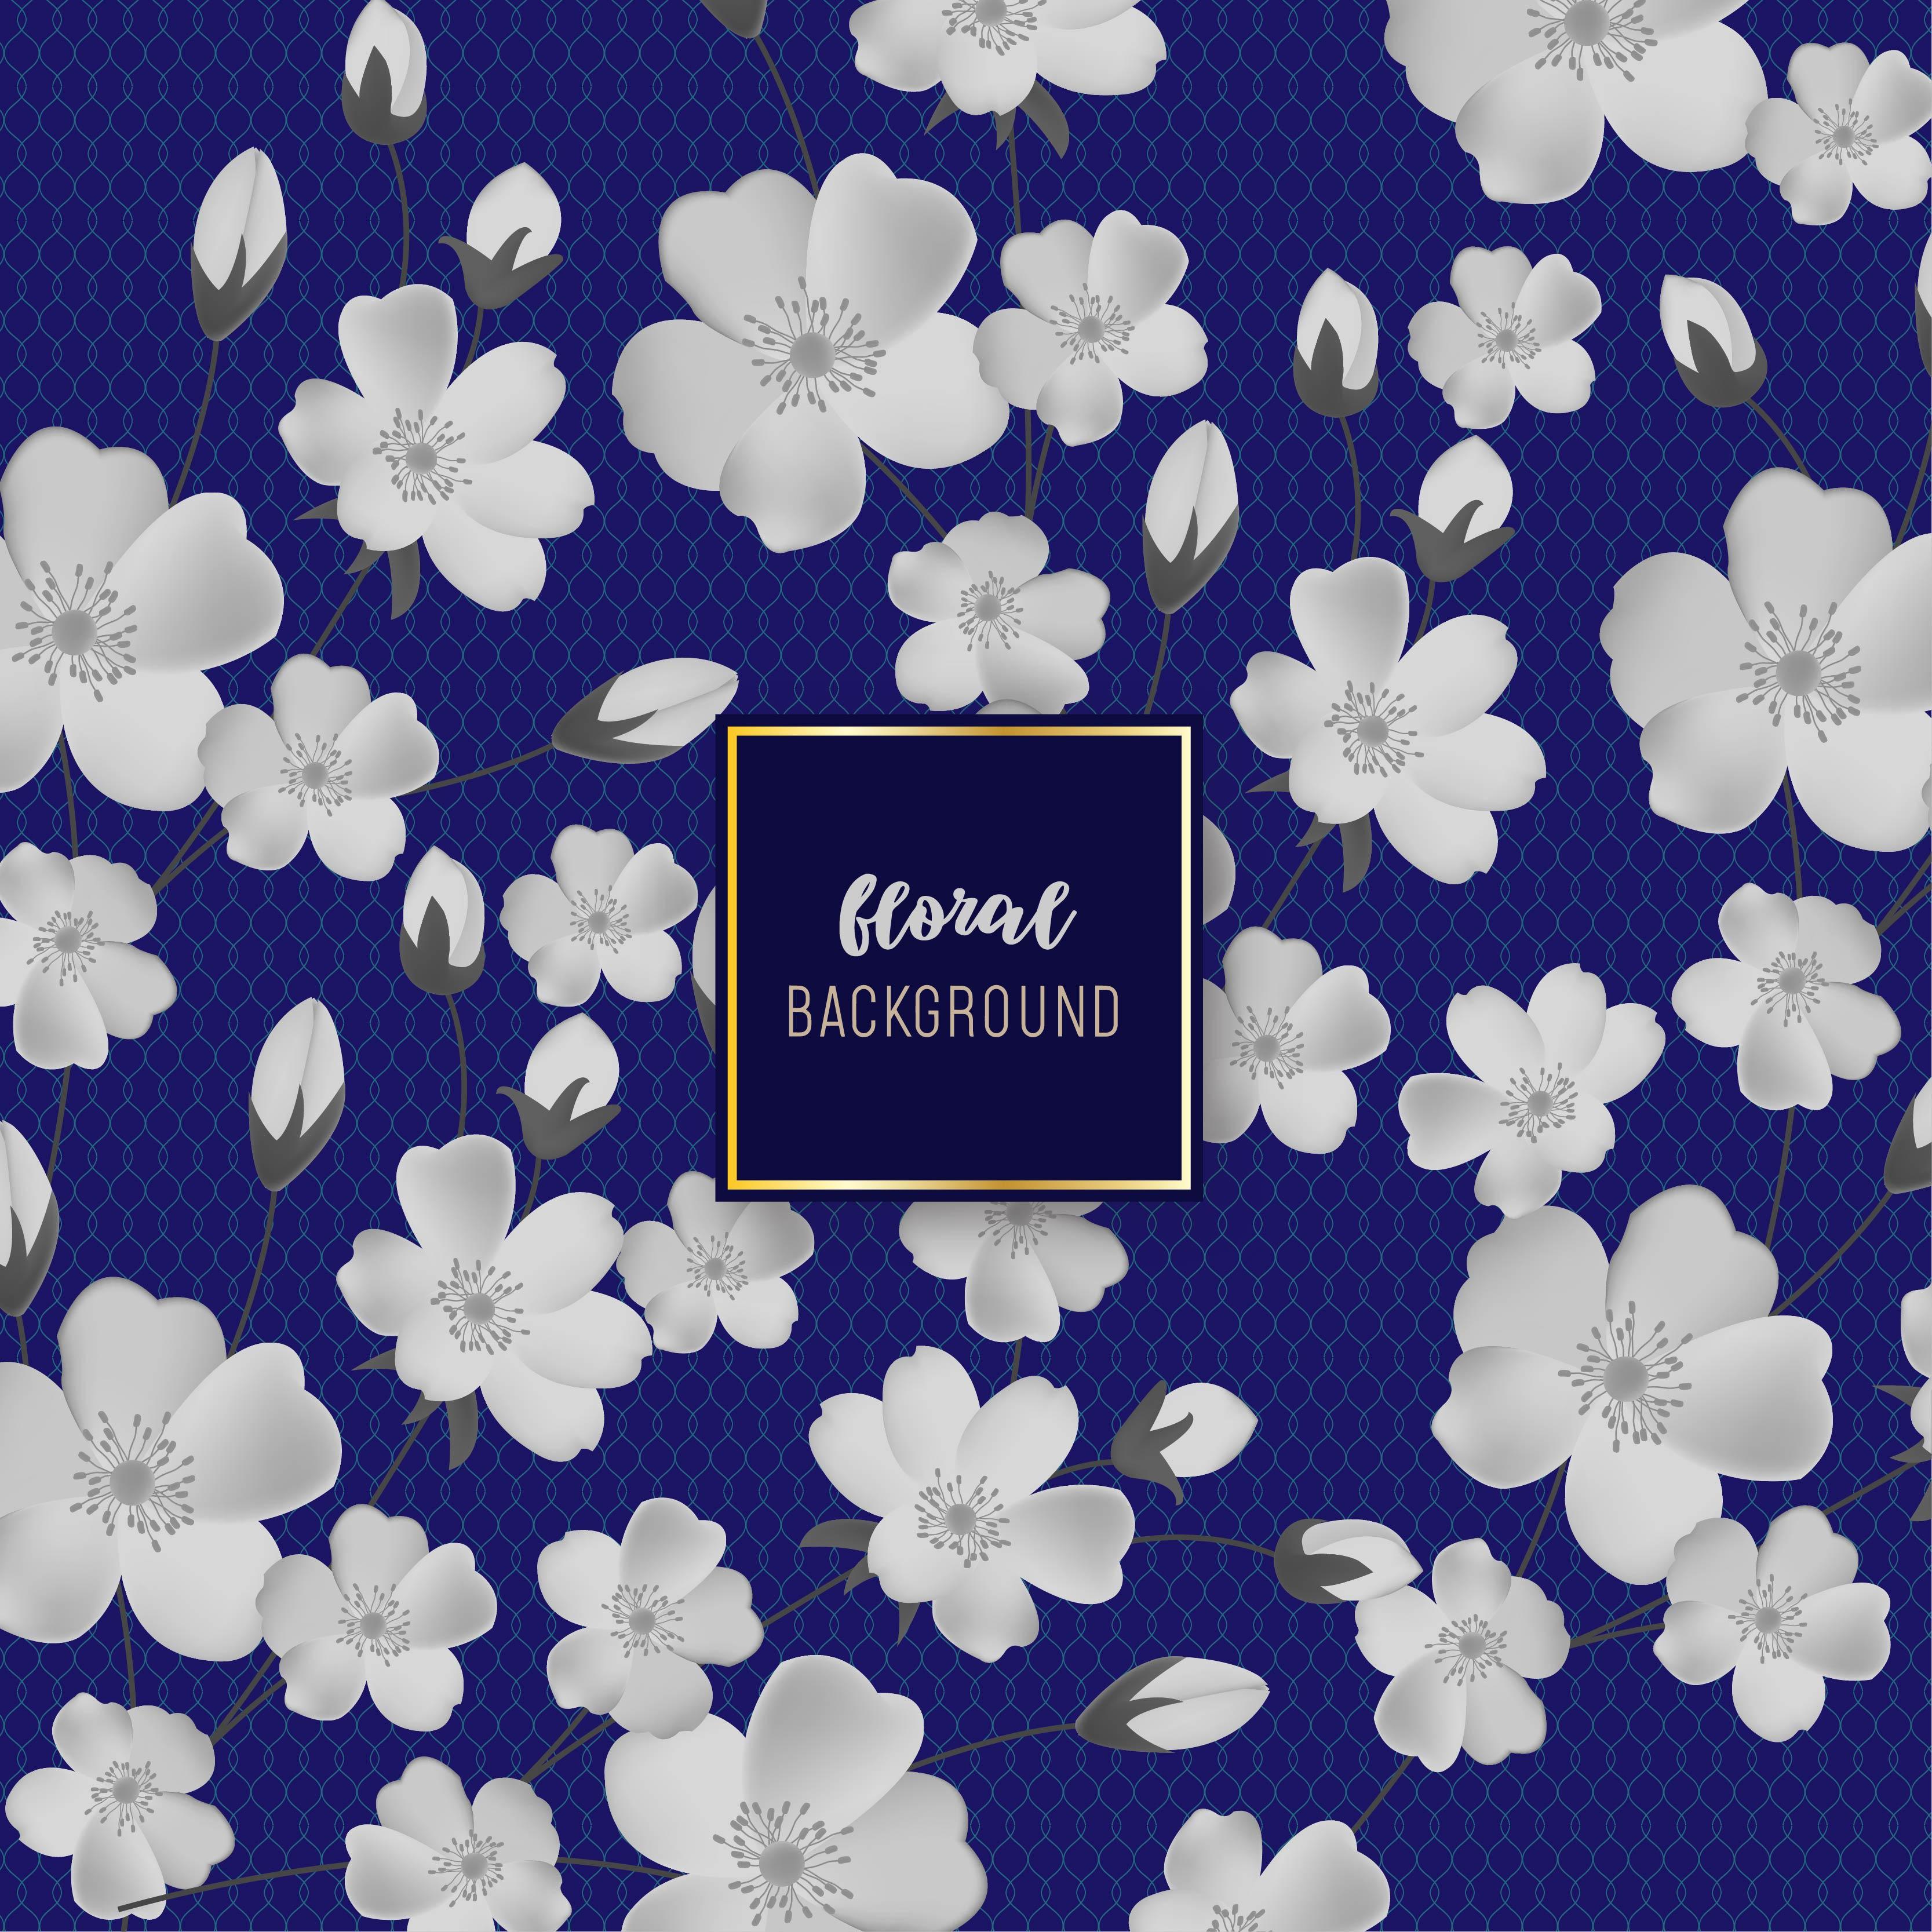 White Flower And Navy Backdrop Floral Background Design Download